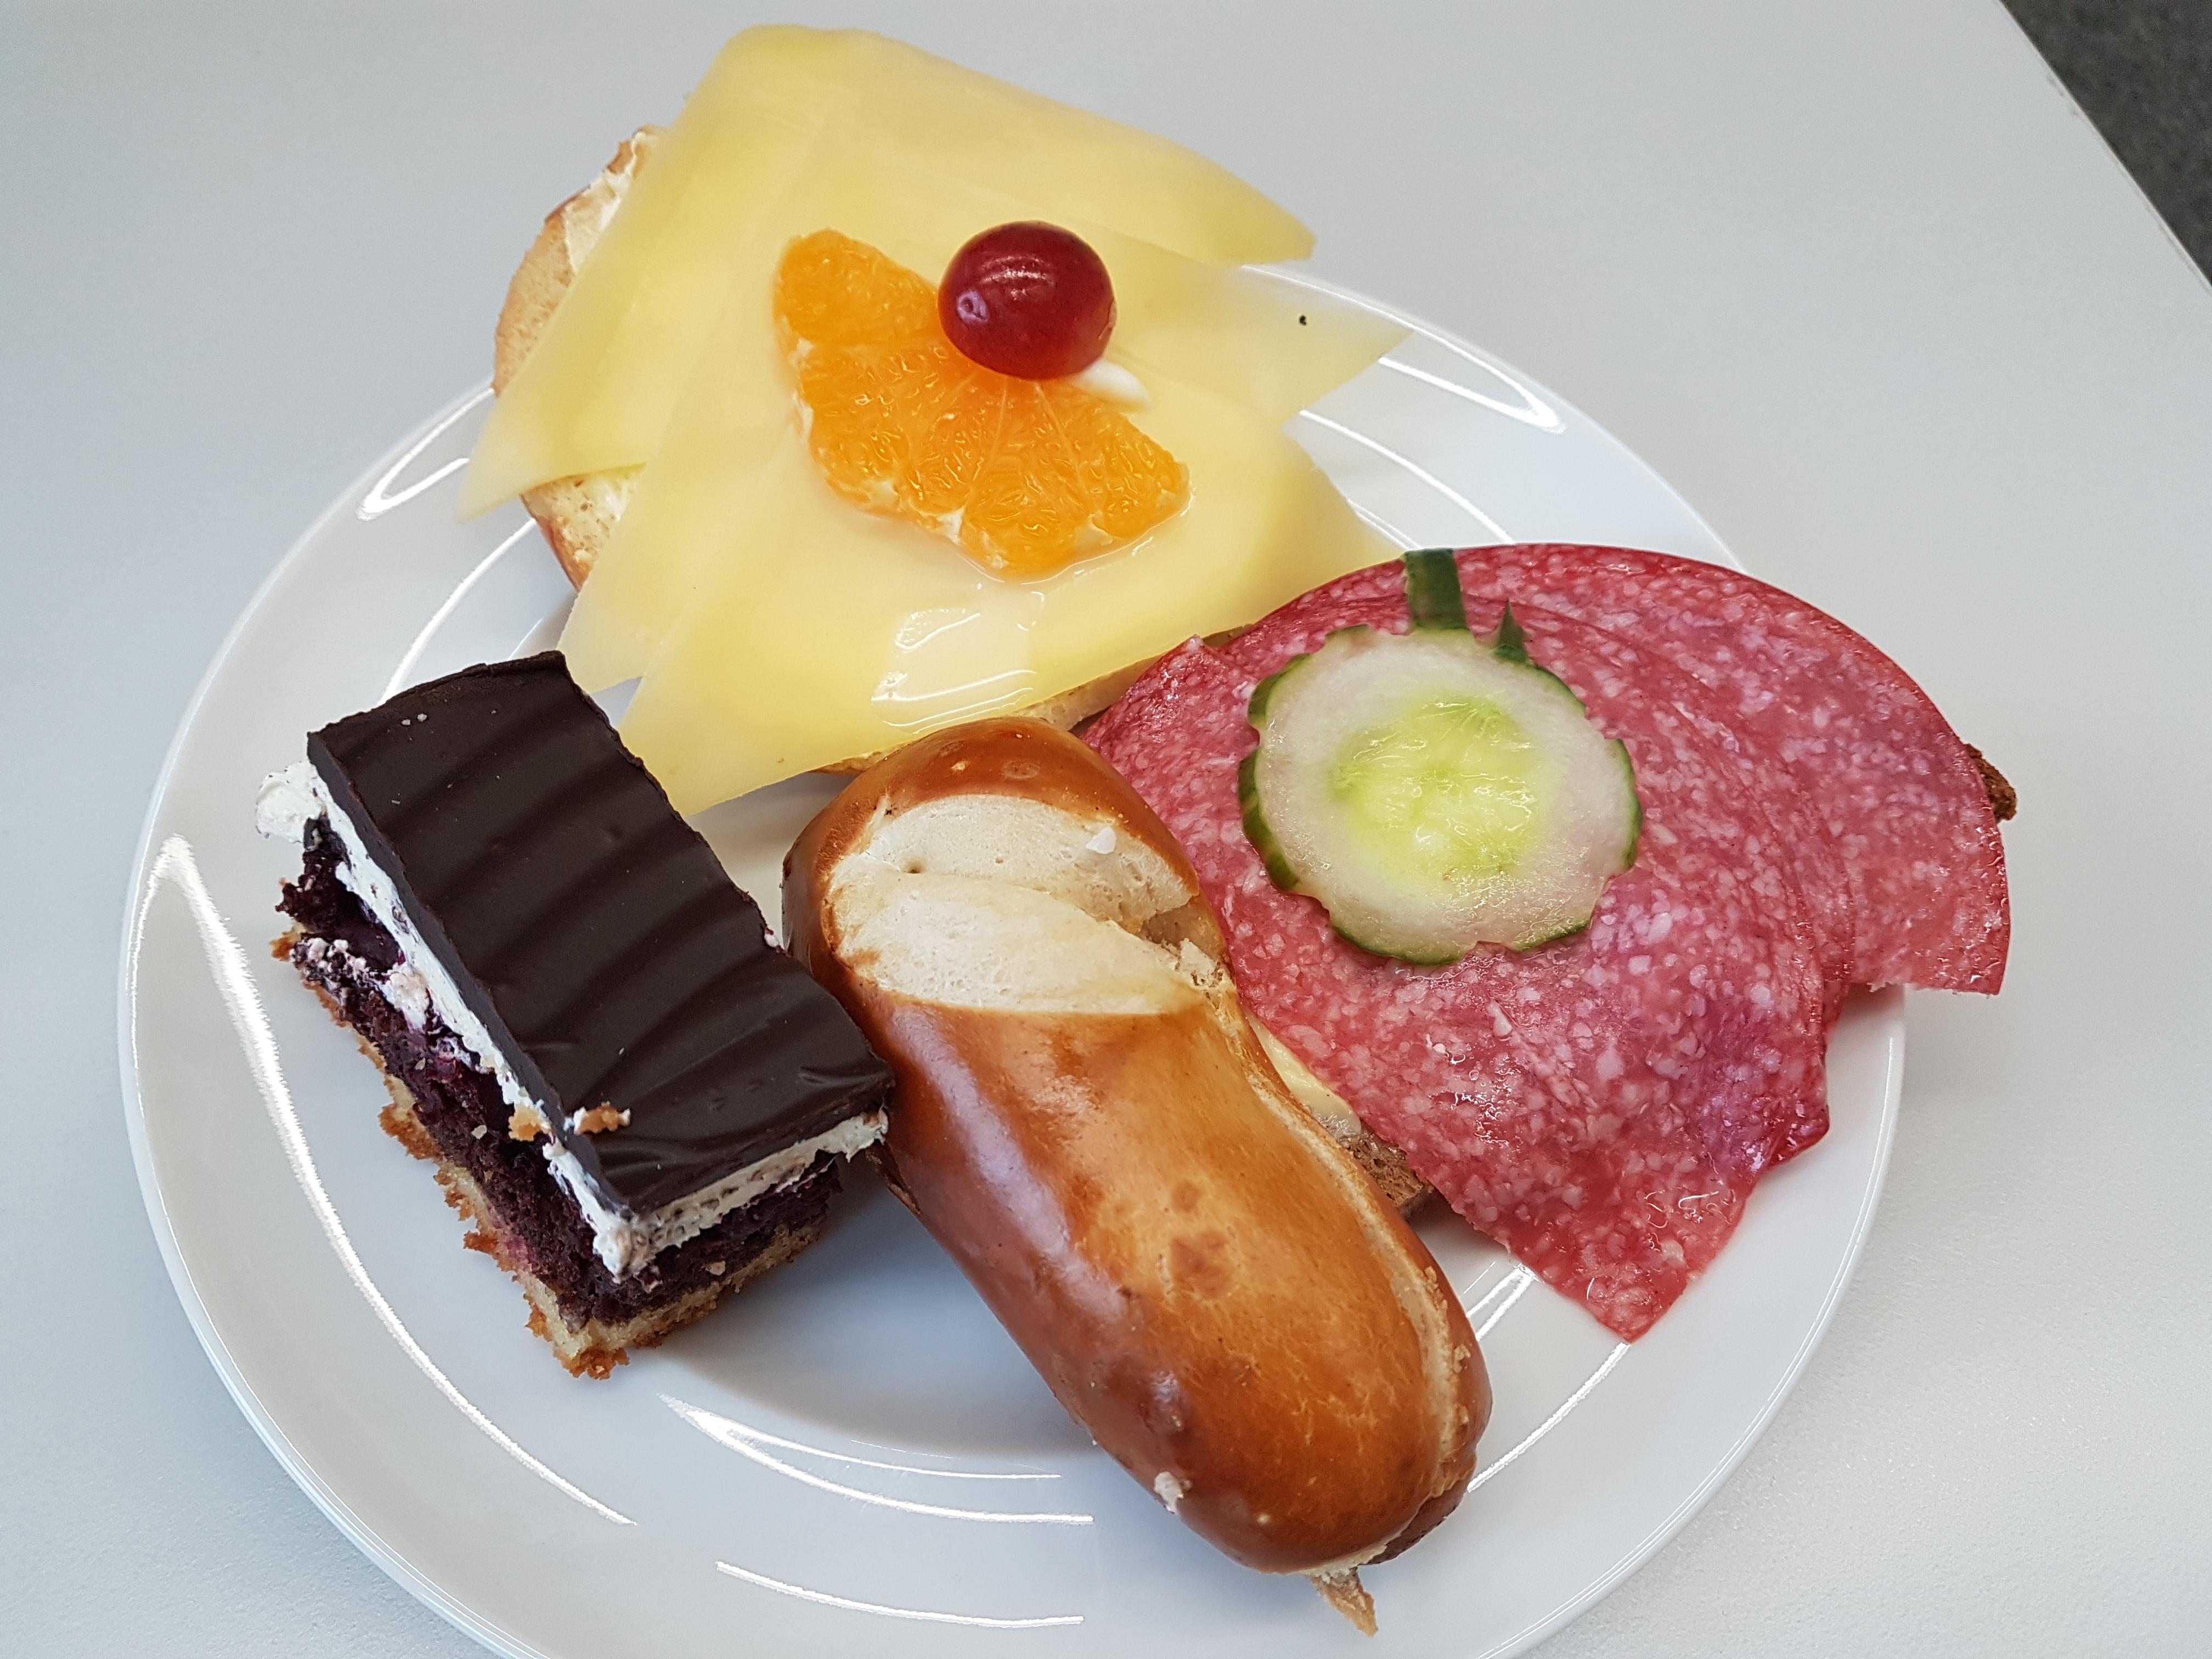 https://foodloader.net/Holz_2017-10-11_Snacks.jpg